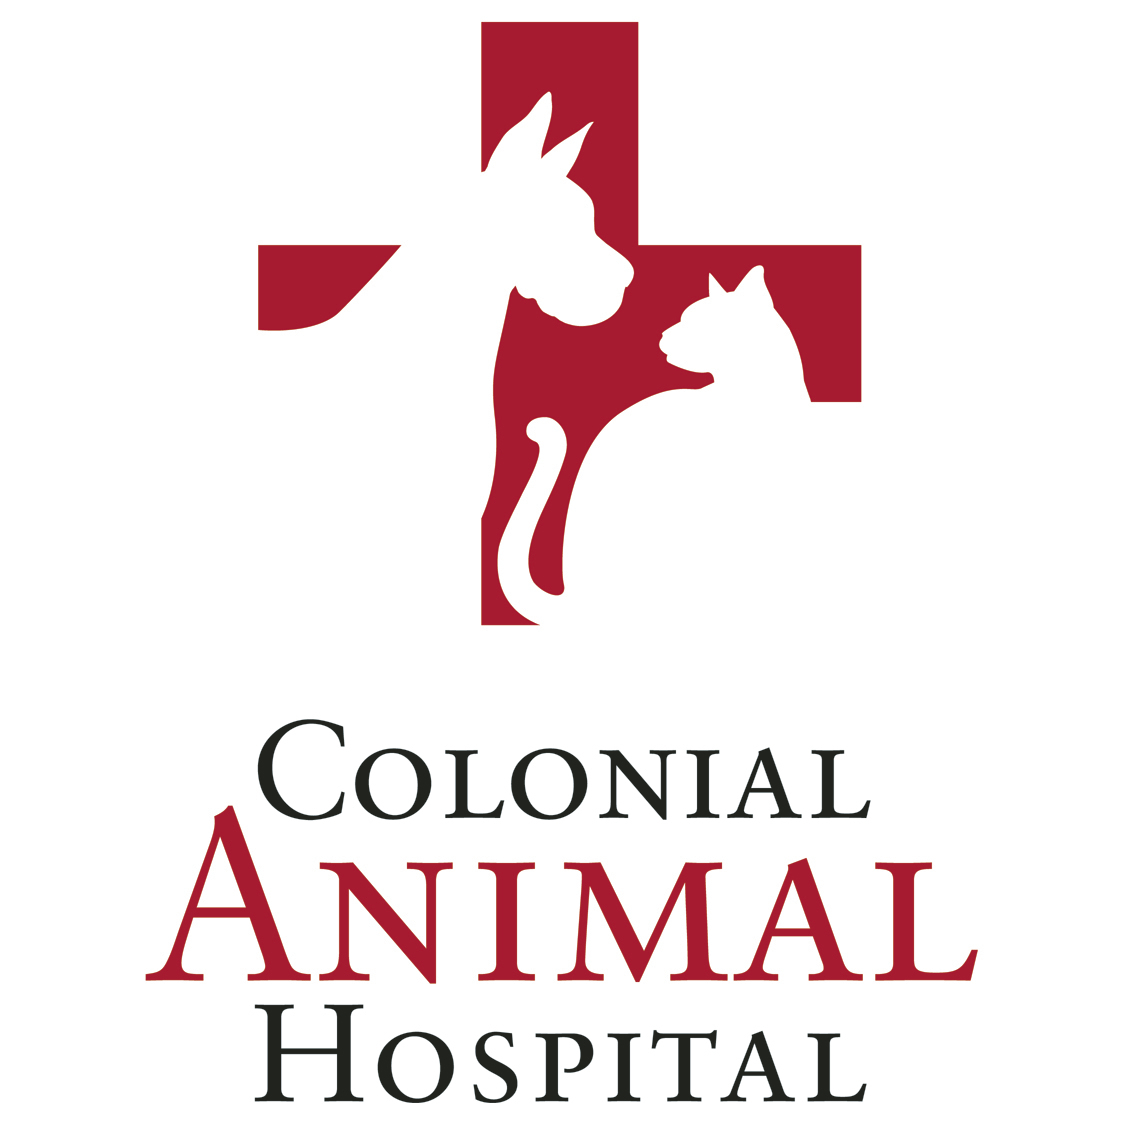 Colonial Animal Hospital image 4